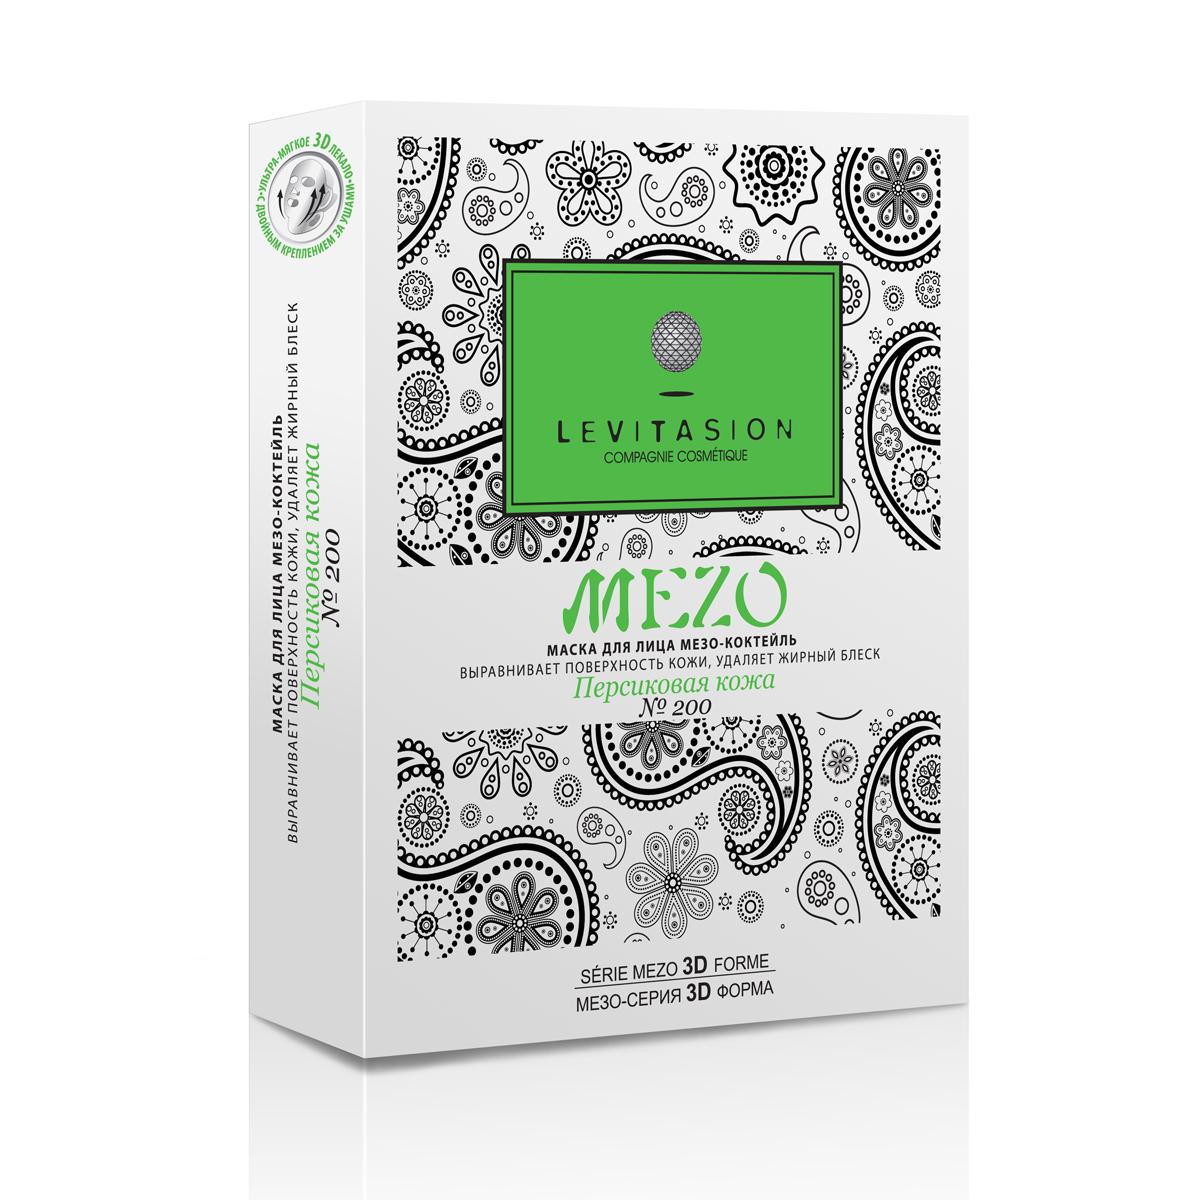 Levitasion MEZO маска для лица Персиковая кожа №200, 5 шт МПН0200